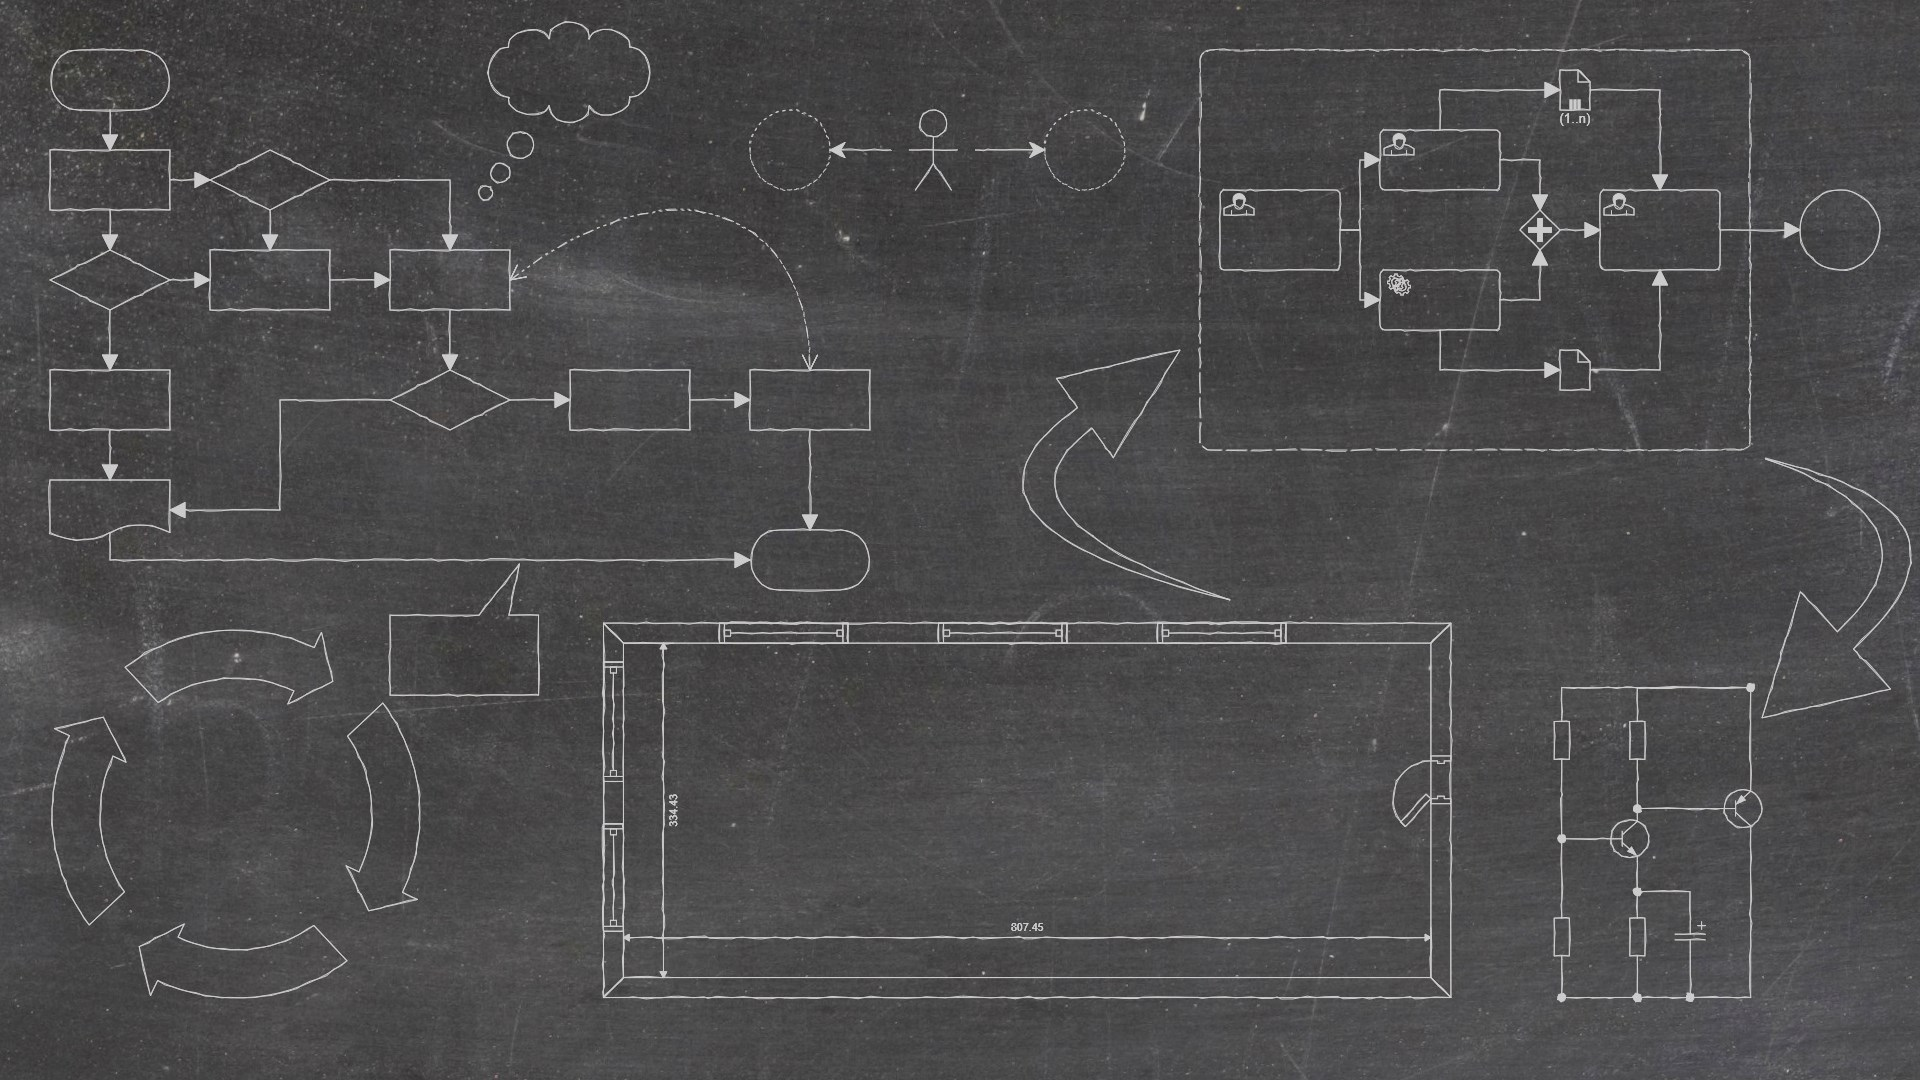 medium resolution of buy grapholite diagrams flow charts and floor plans designer microsoft store